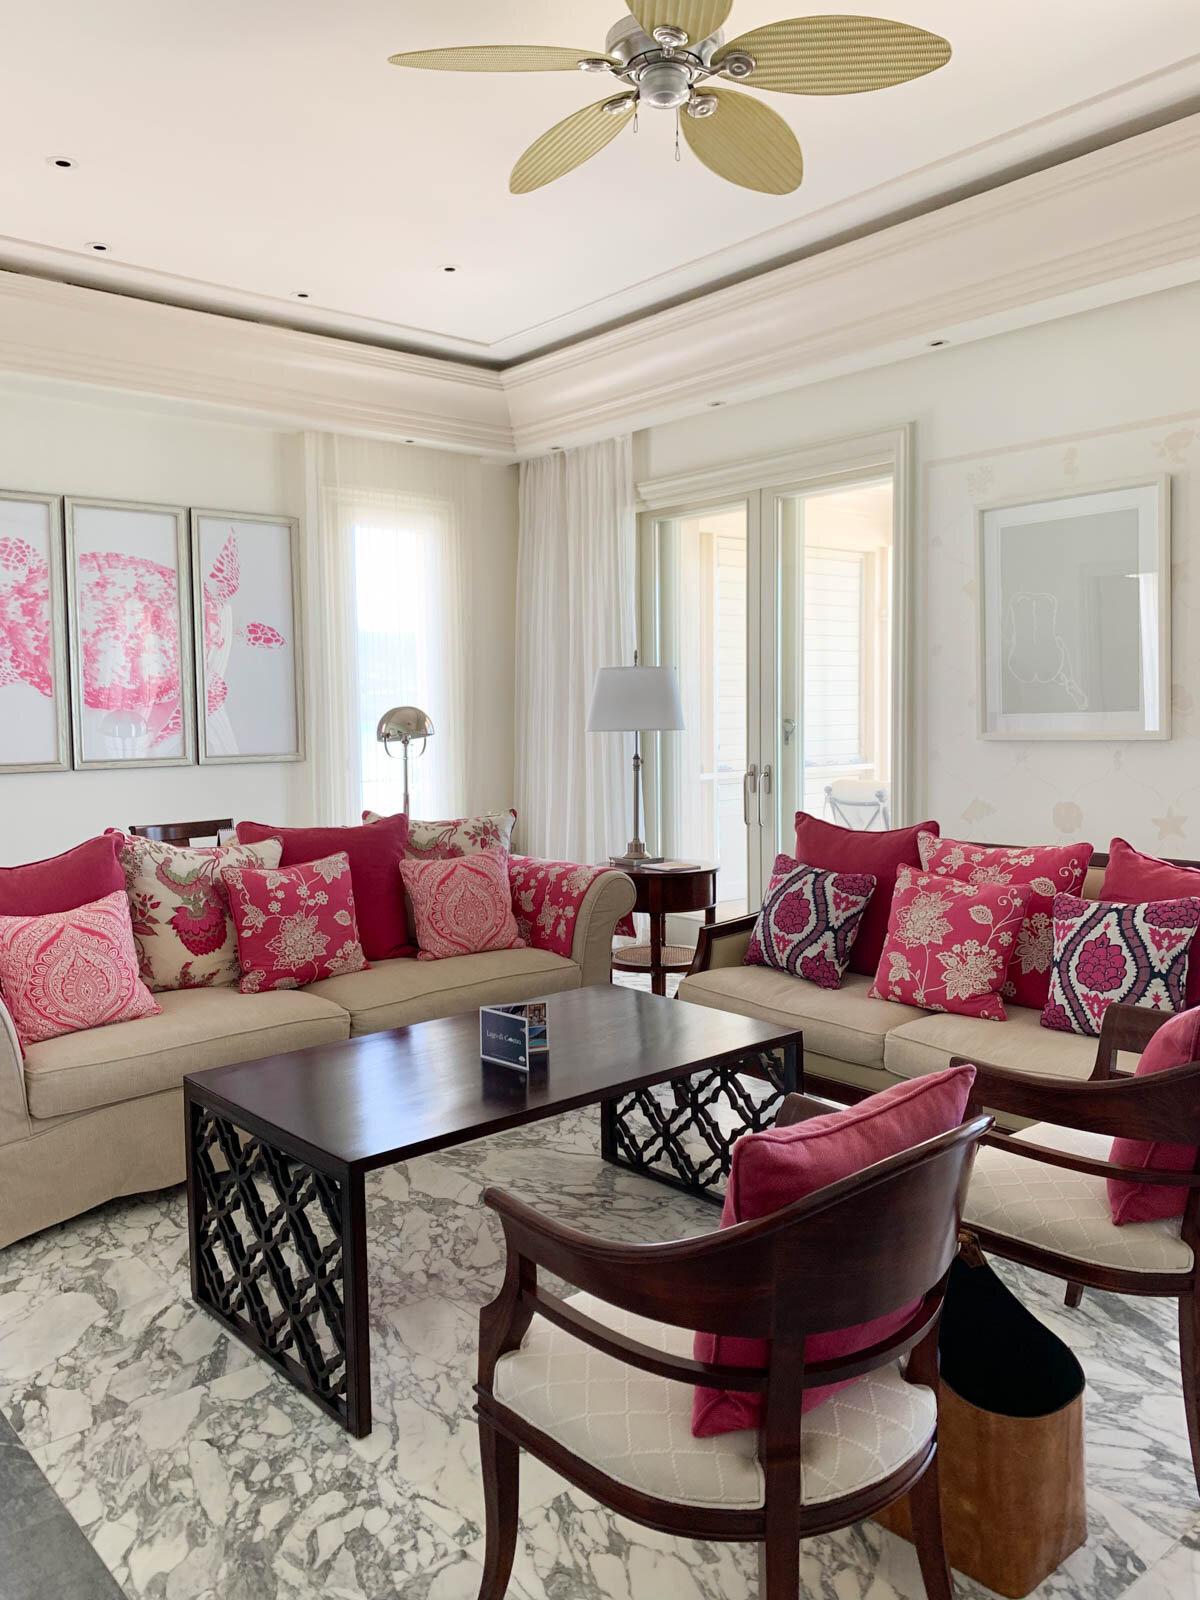 Mandarin Oriental Canouan - Best Canouan Hotel_Addie Bell_Best Travel Agent-11.jpg